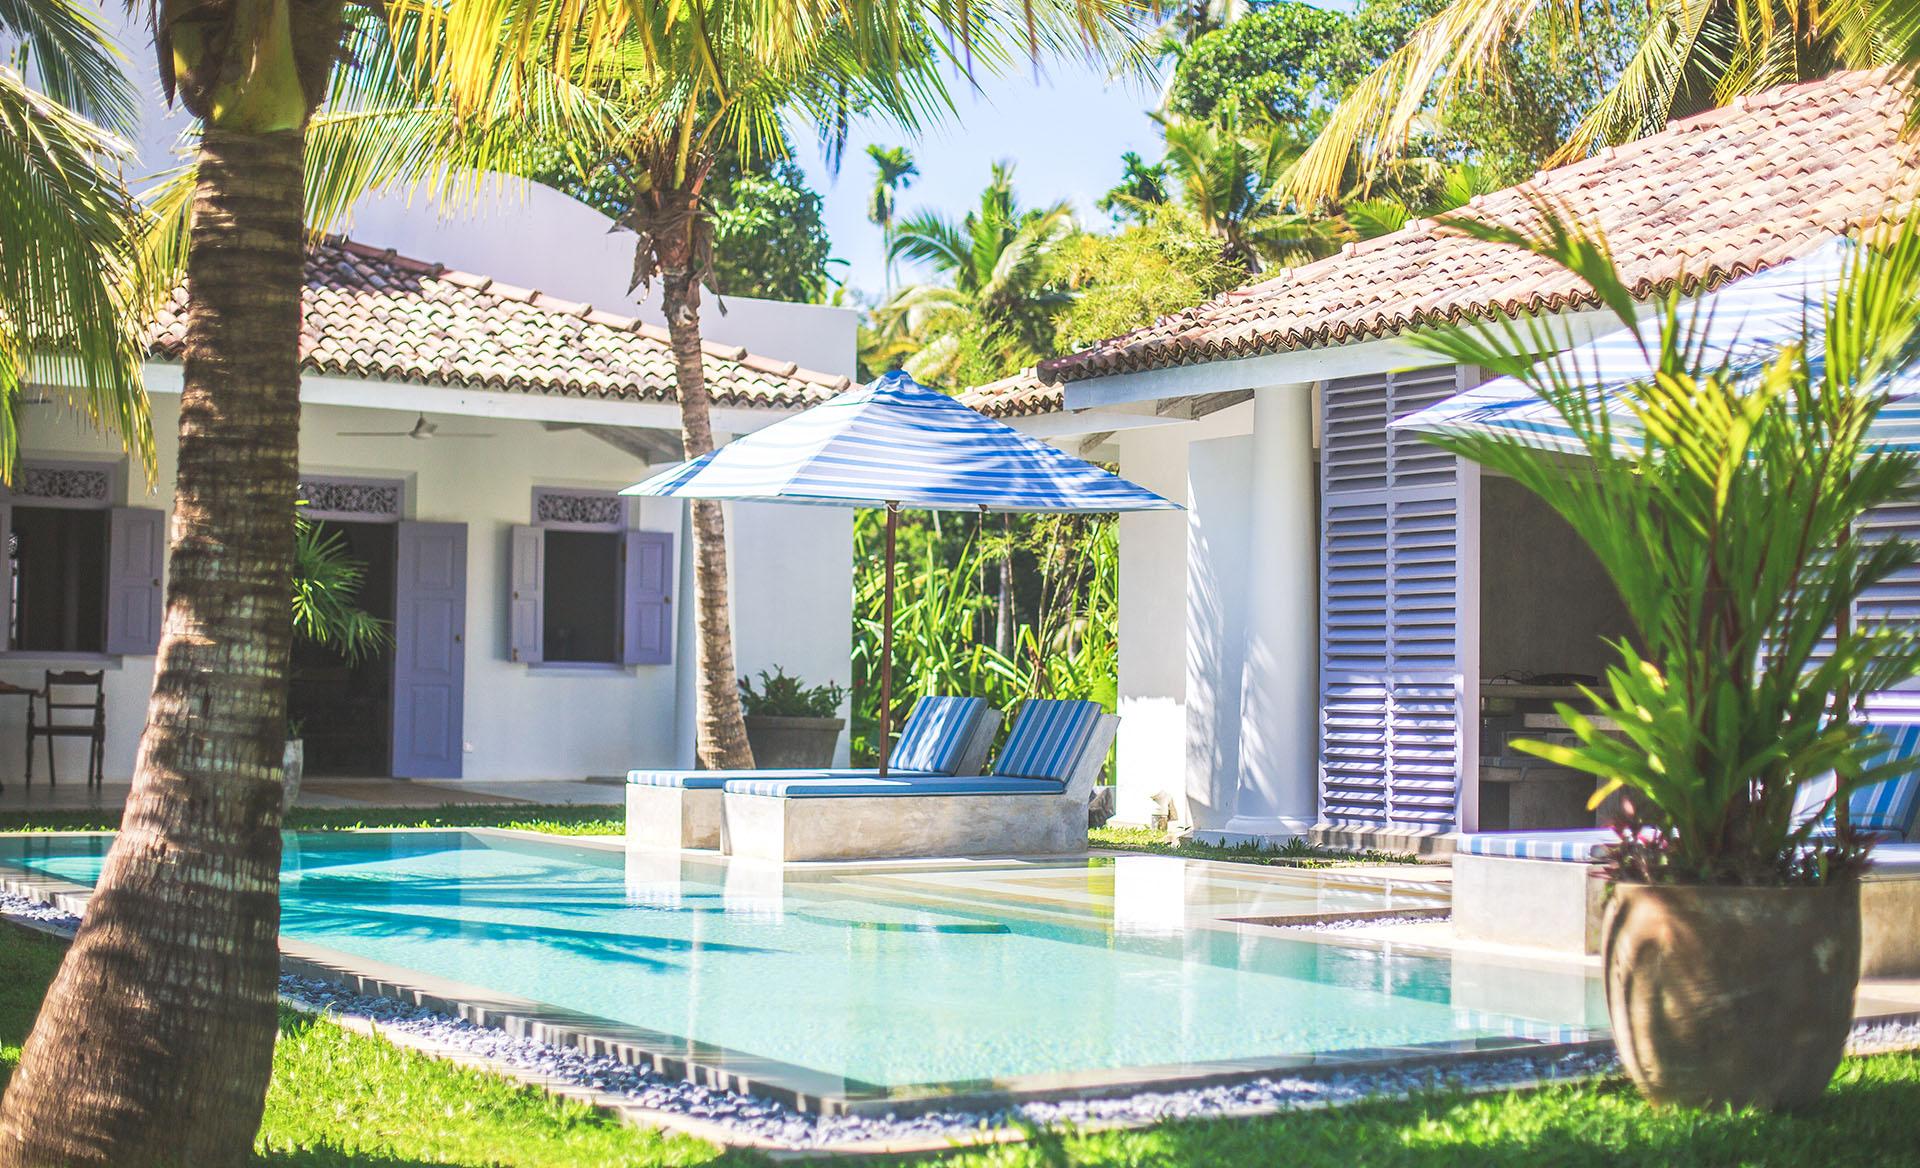 Thalduwa_island_villas_south_sri_lanka_holiday_hero-Recovered.psdVador.jpg